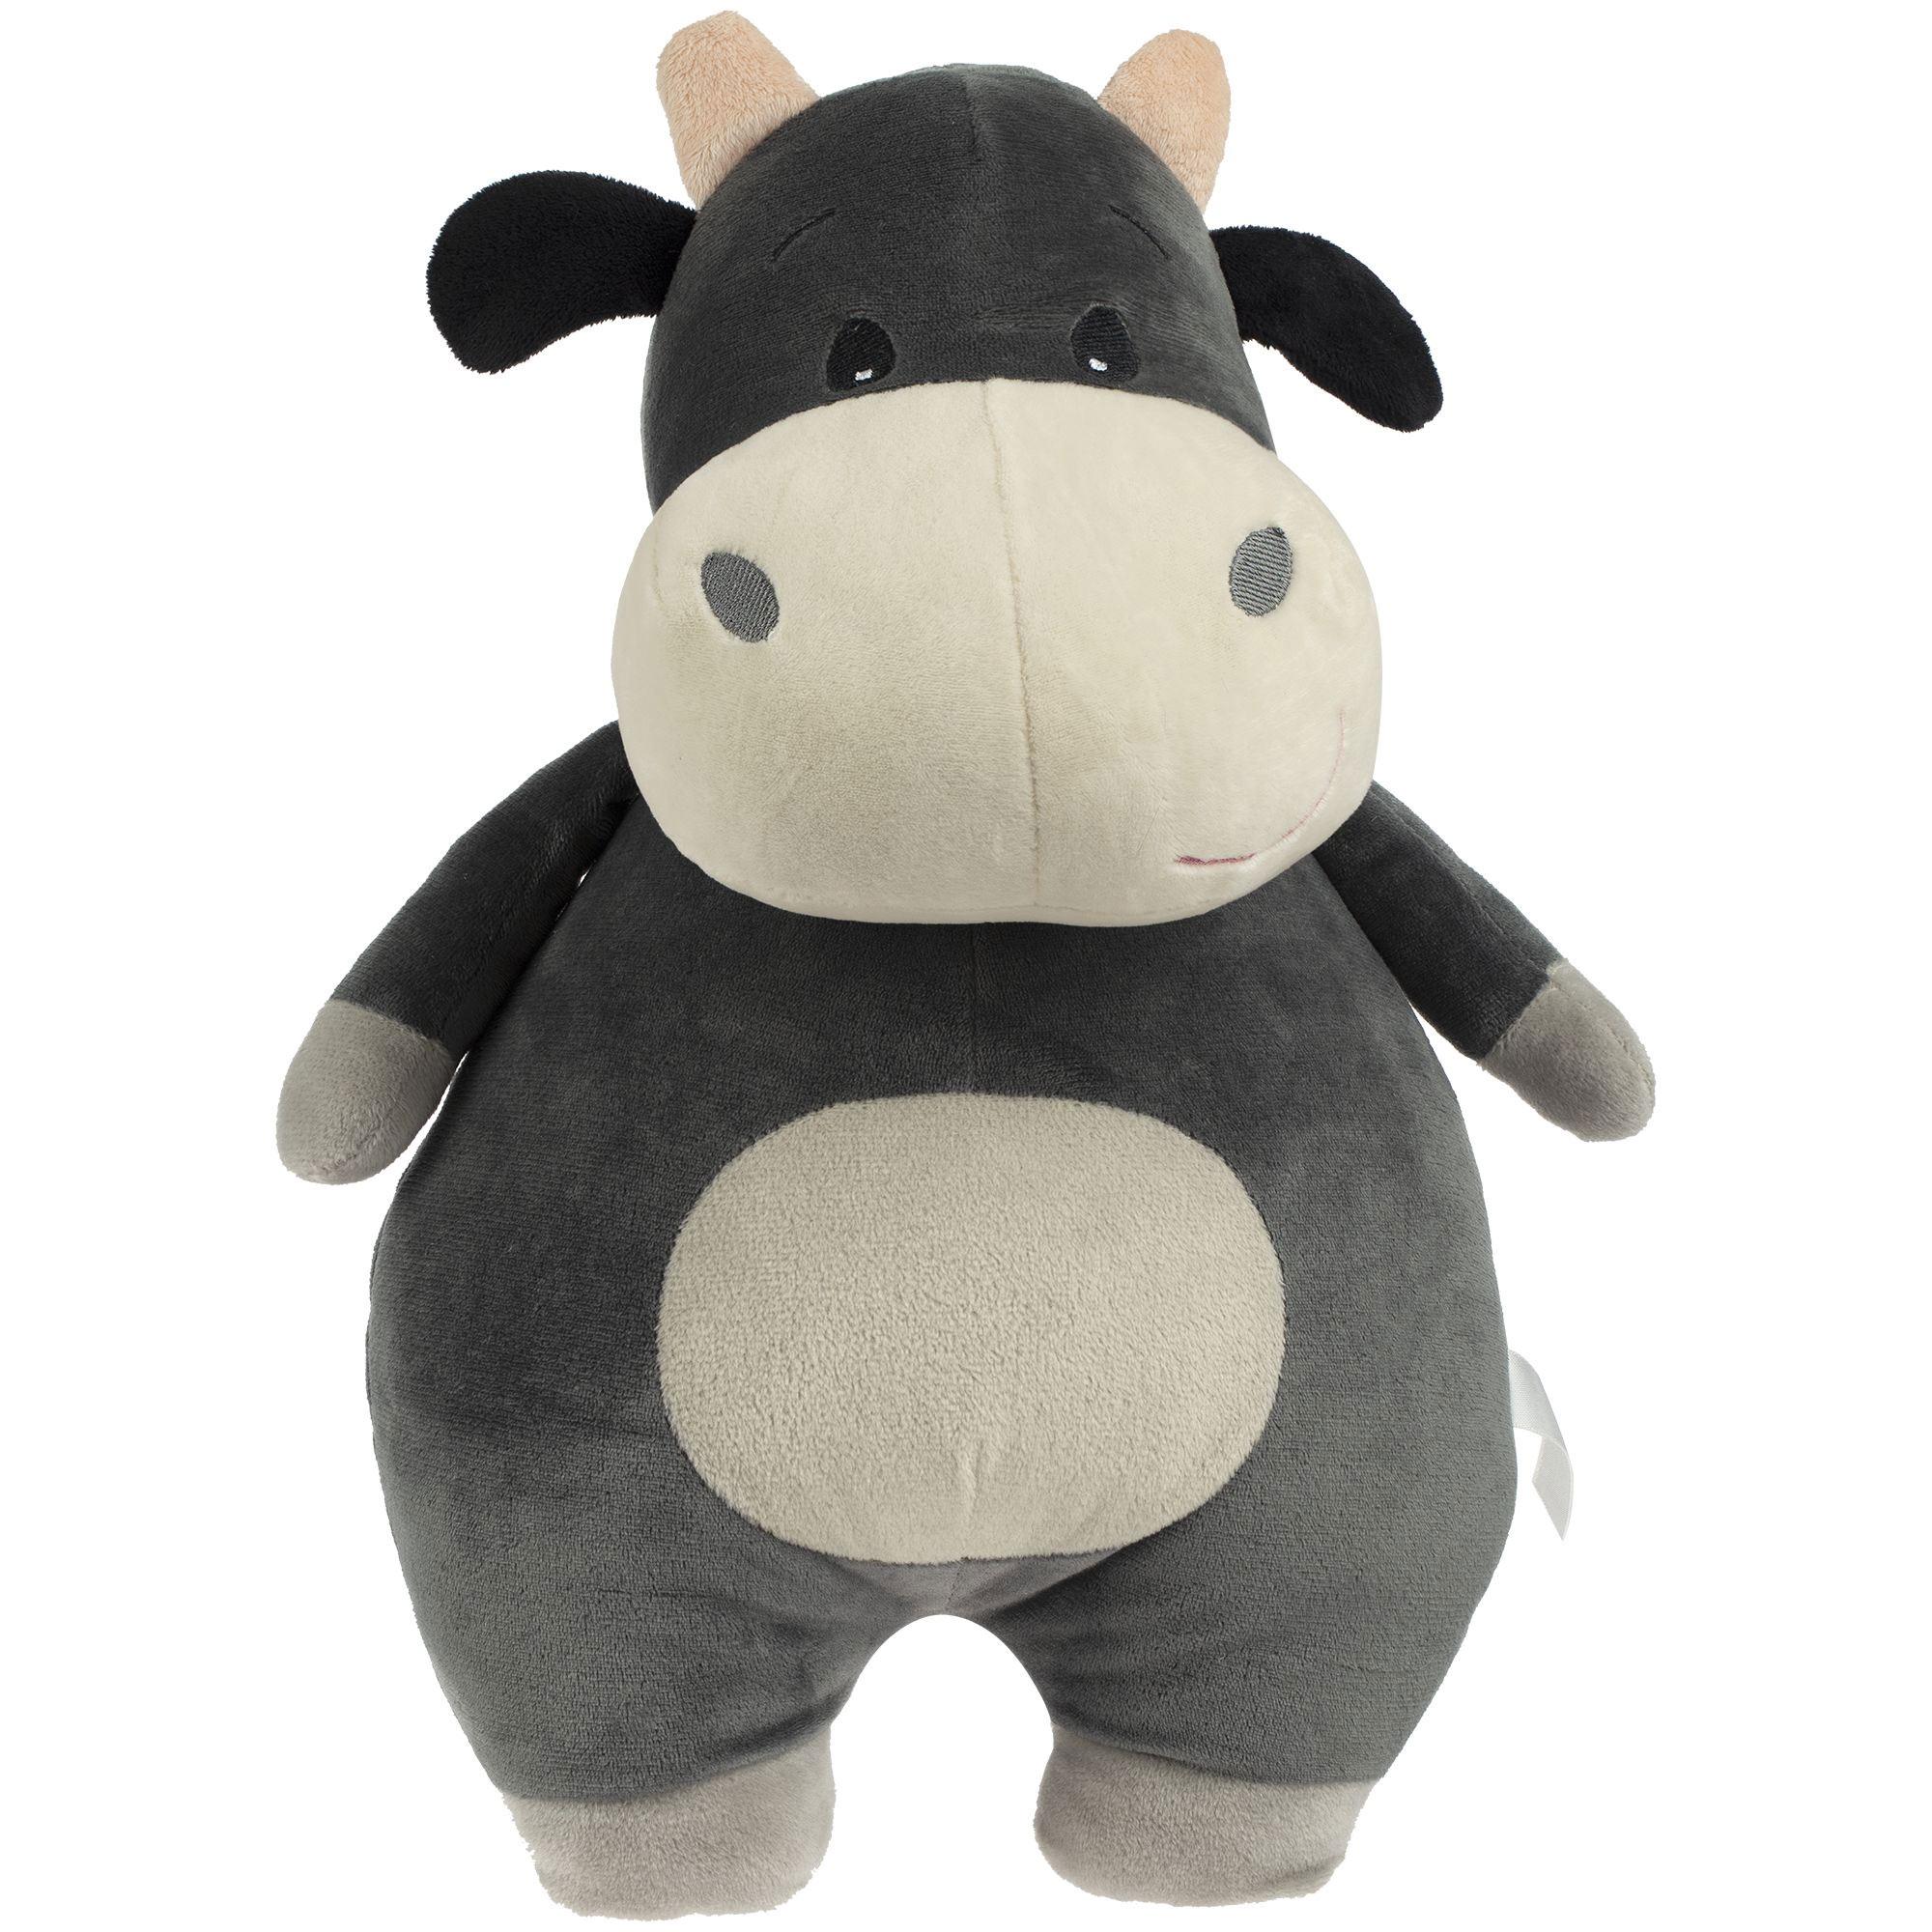 Игрушка Puffy, темно-серая арт 12640.02